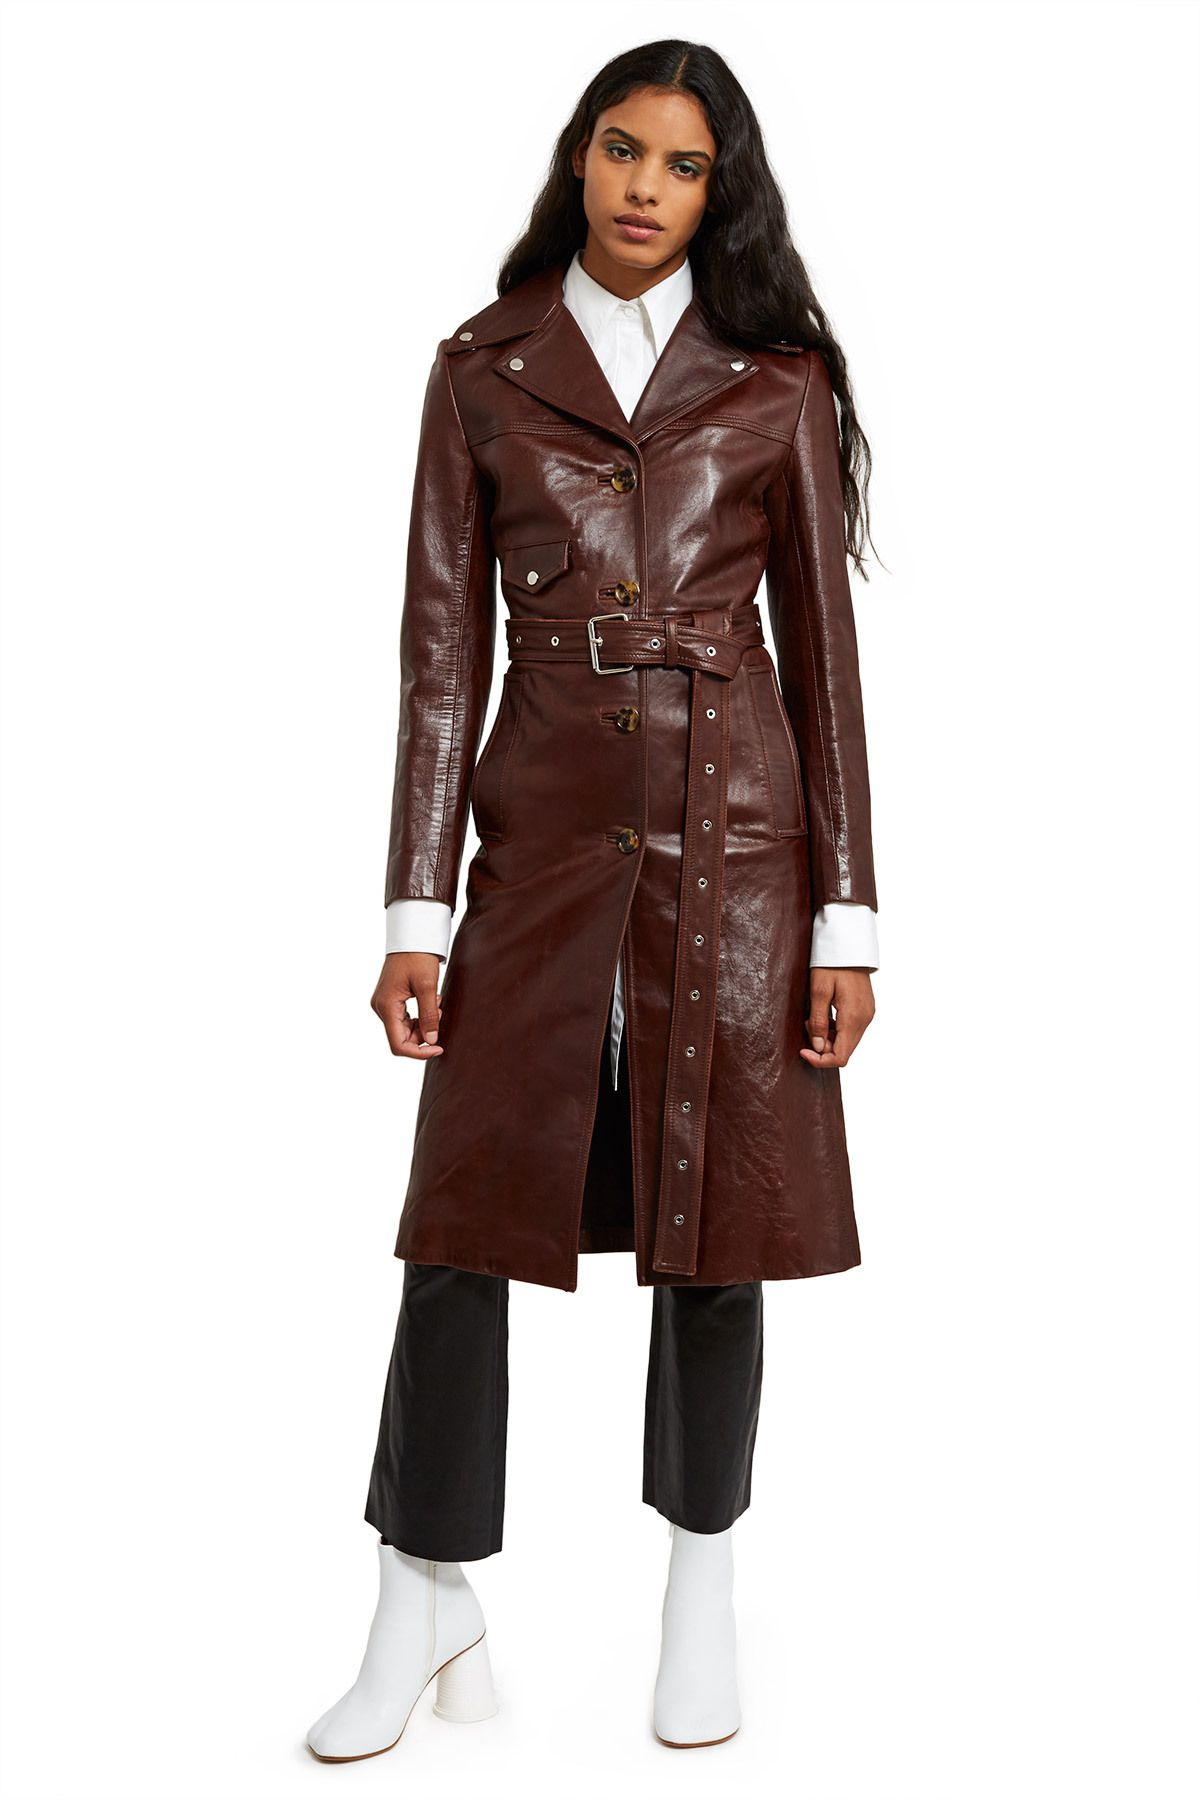 Ladies supermodel Olive Green Biker Style Designer Real Italian Leather Jacket